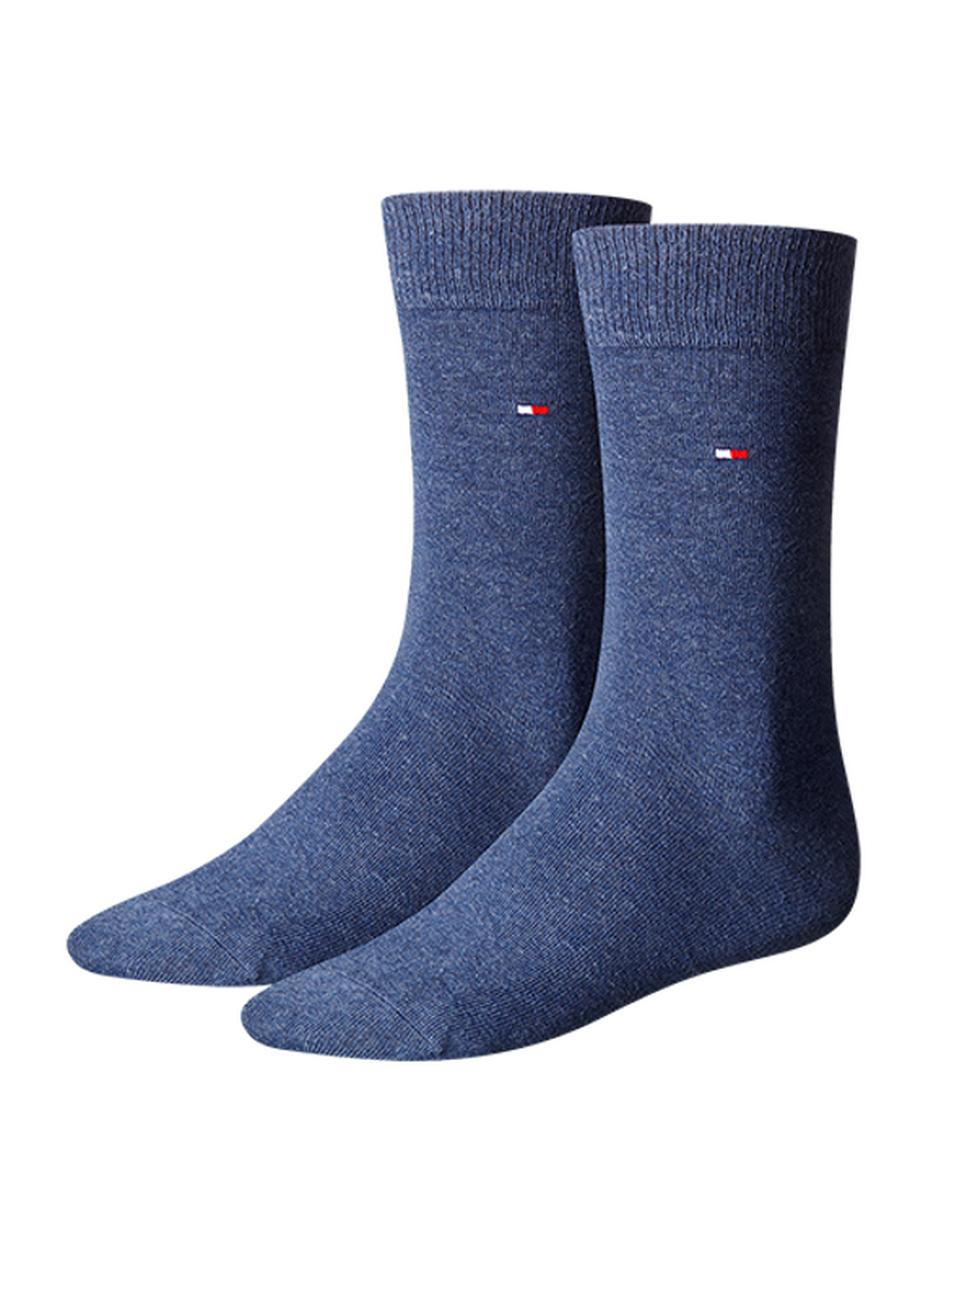 Tommy Hilfiger Herrensocken Classic Business Socken - 2er Pack 47-49, jeans (356)